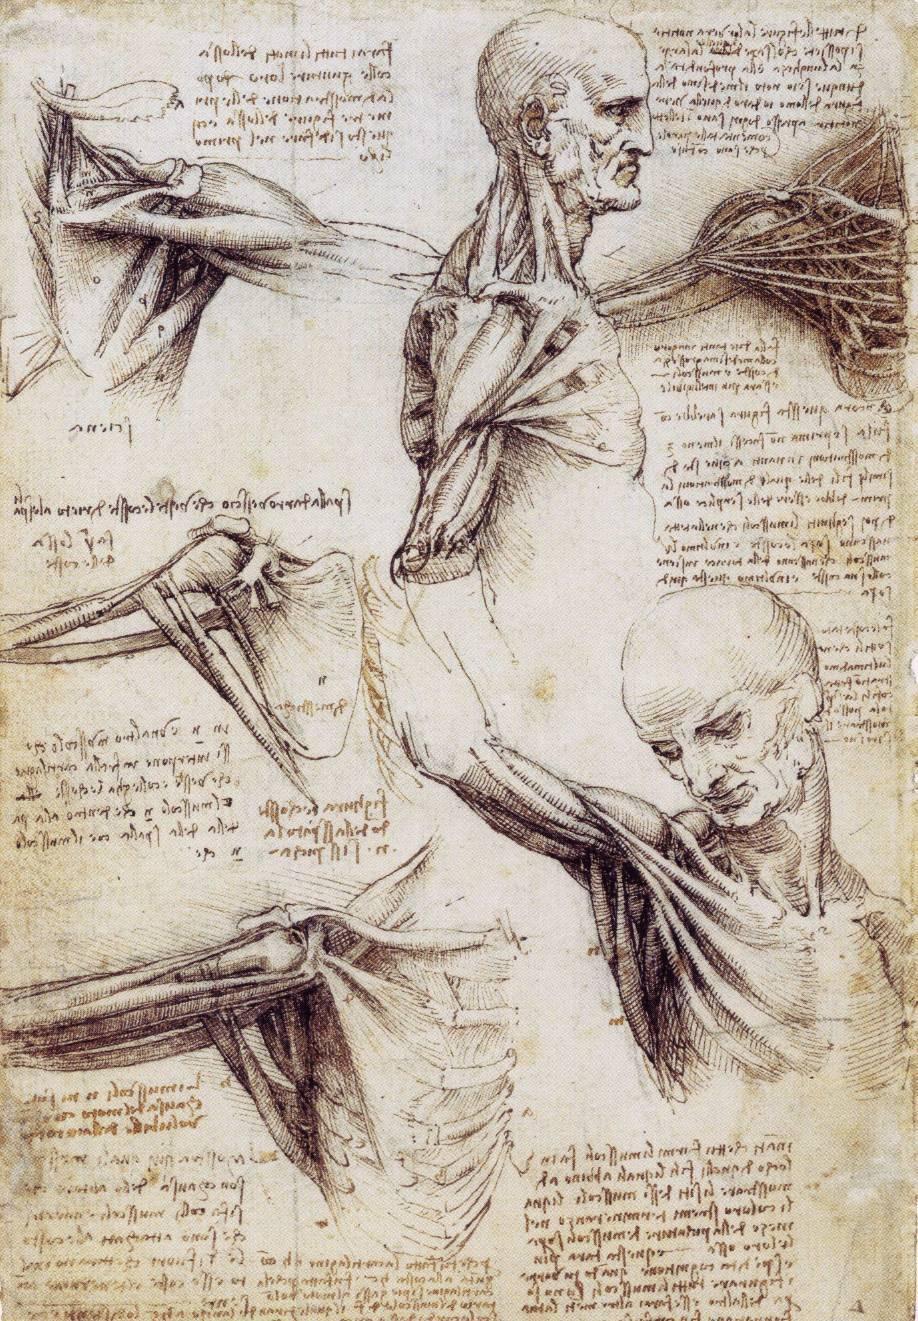 Drawing by da Vinci